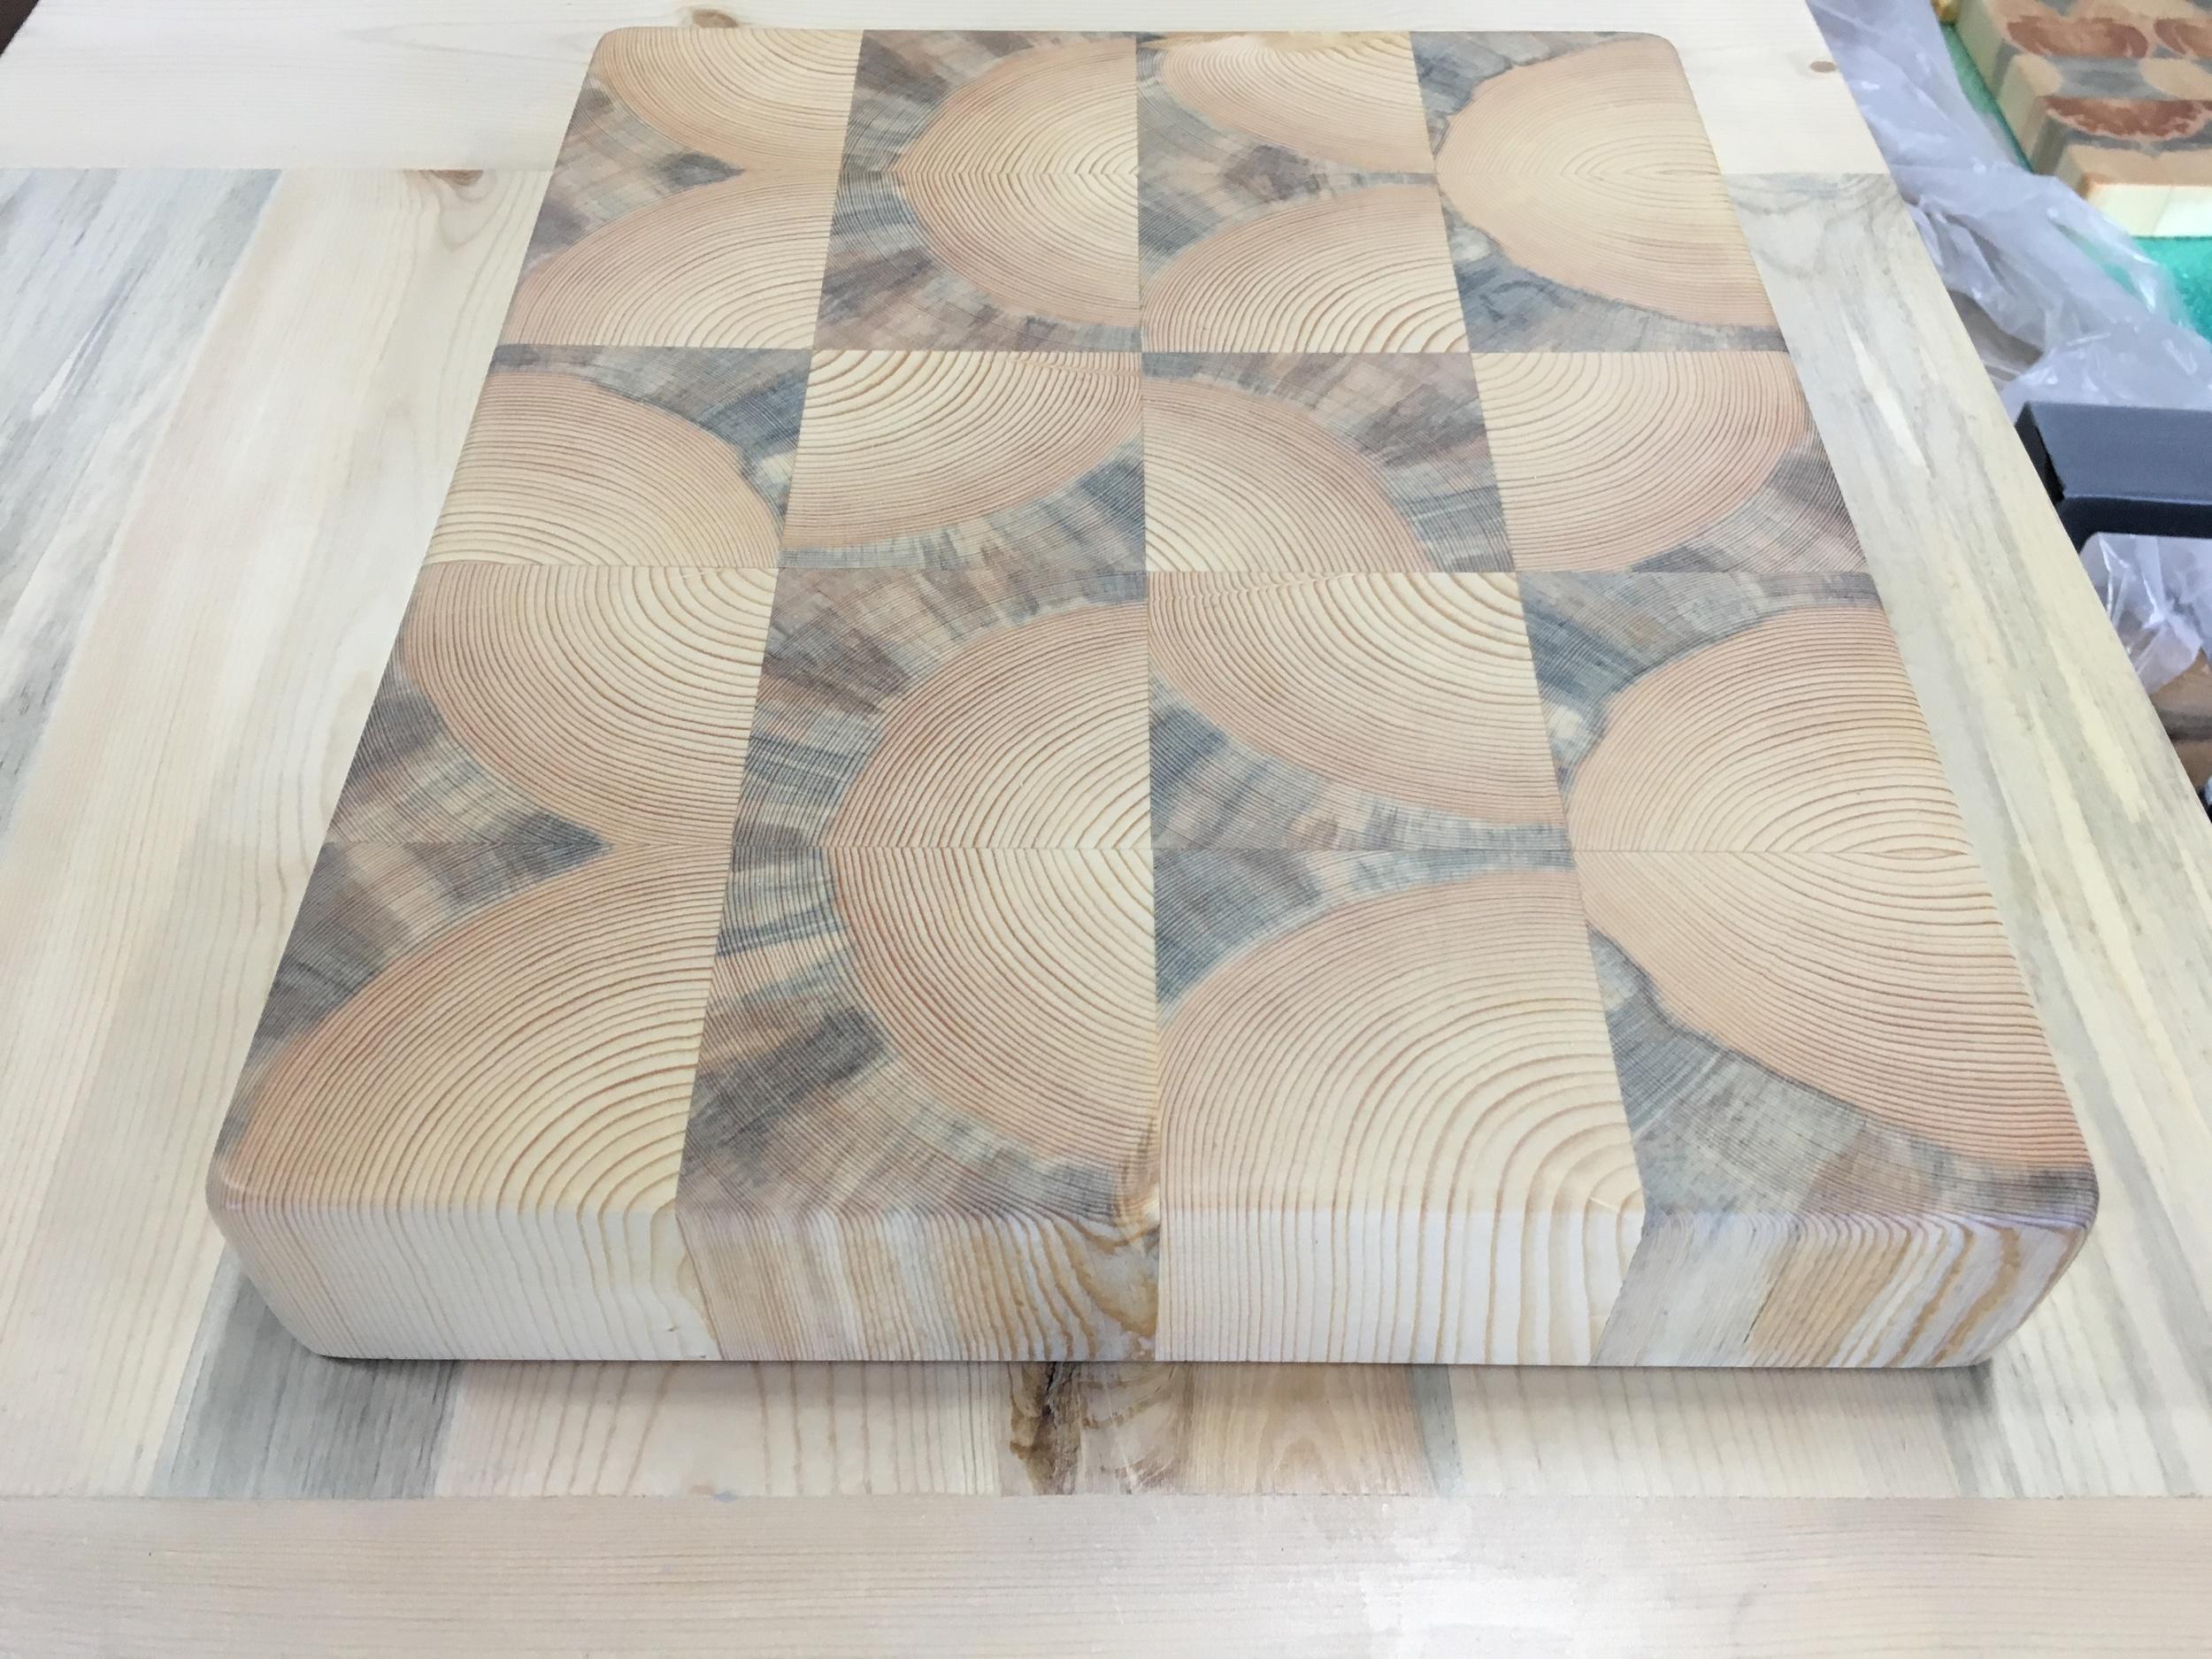 Colorado Tables - Butcher Block Cutting Board